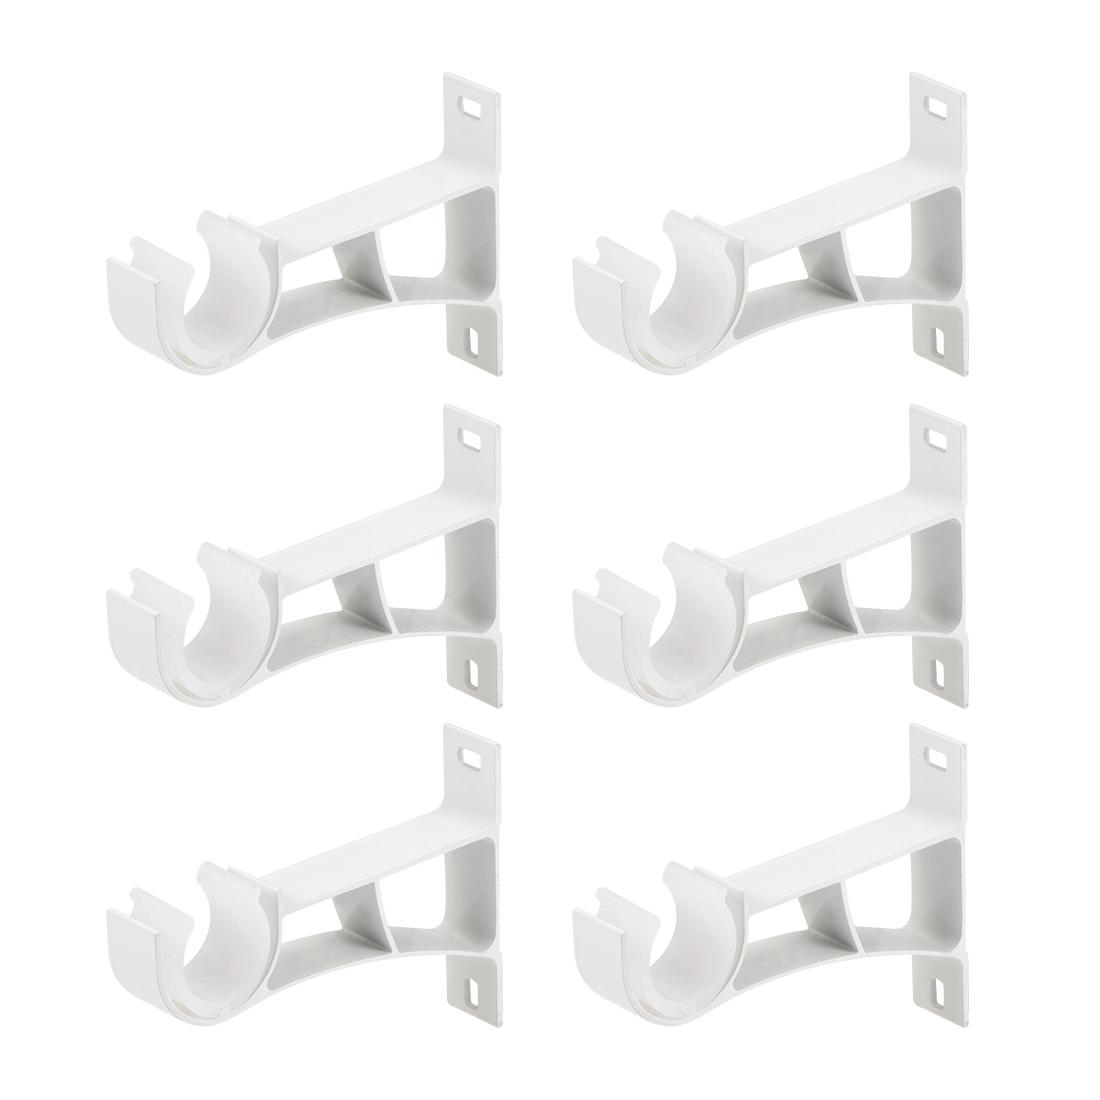 Curtain Rod Bracket Single Holder for 24mm Rod, 108 x 78 x 19mm Milky White 6Pcs